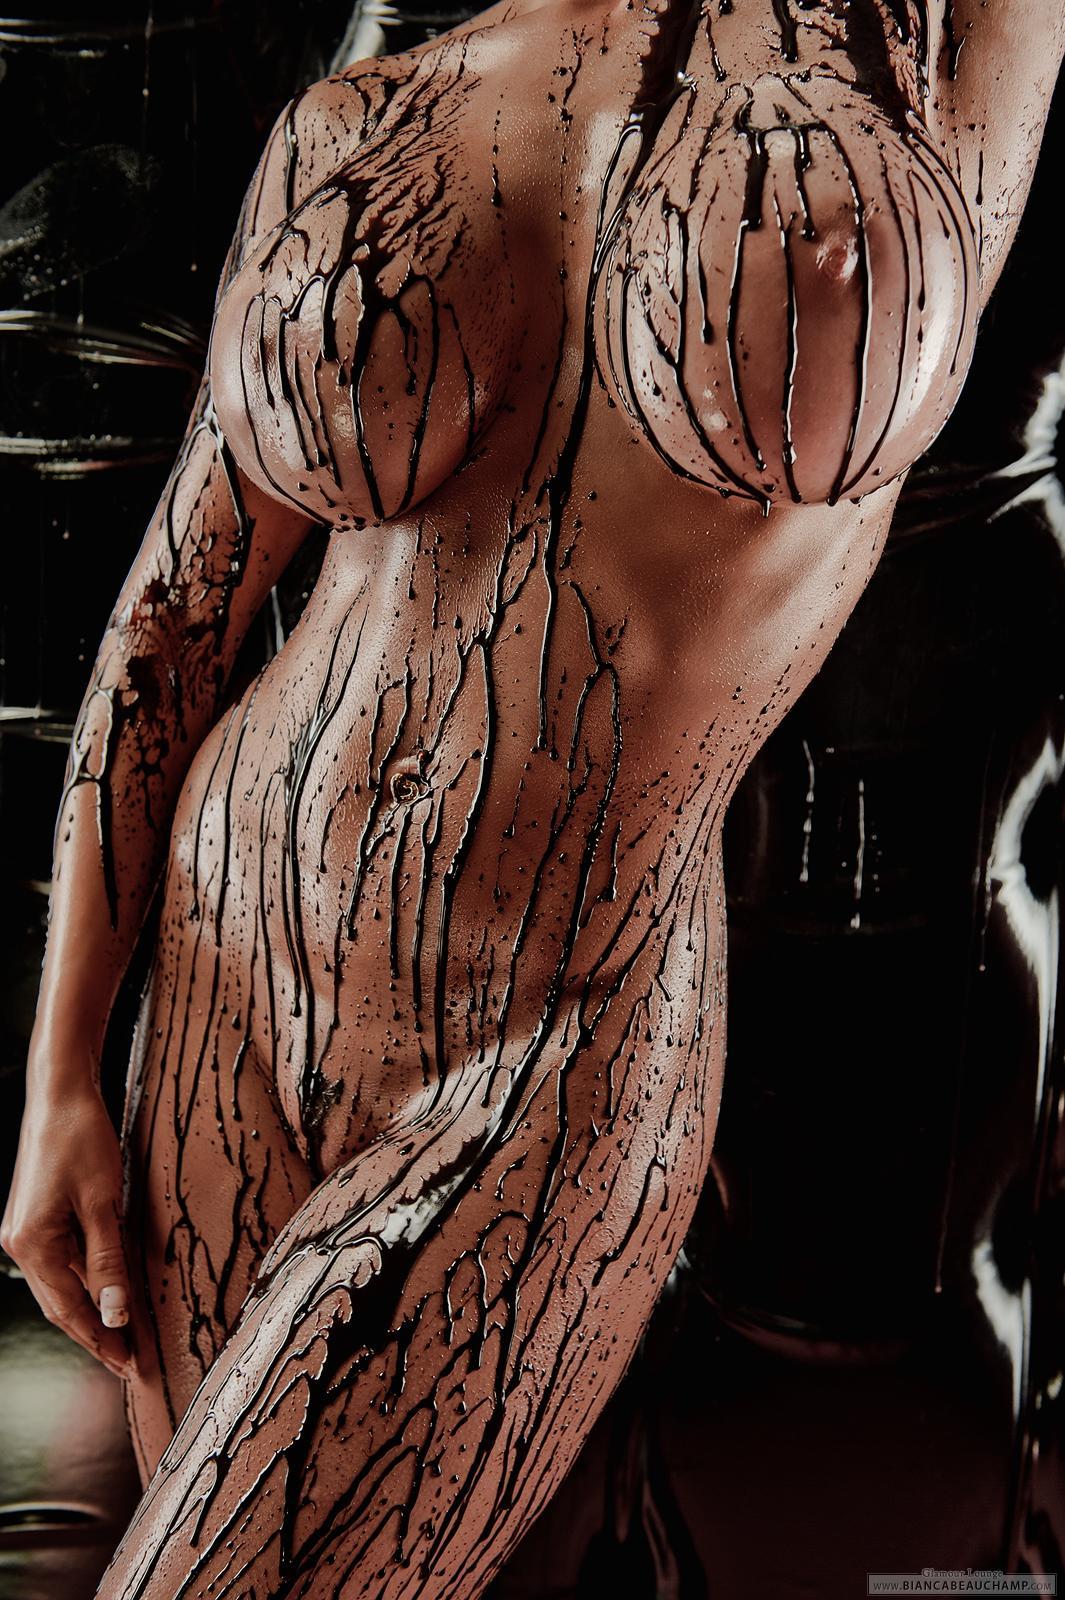 Bianca king hot nude